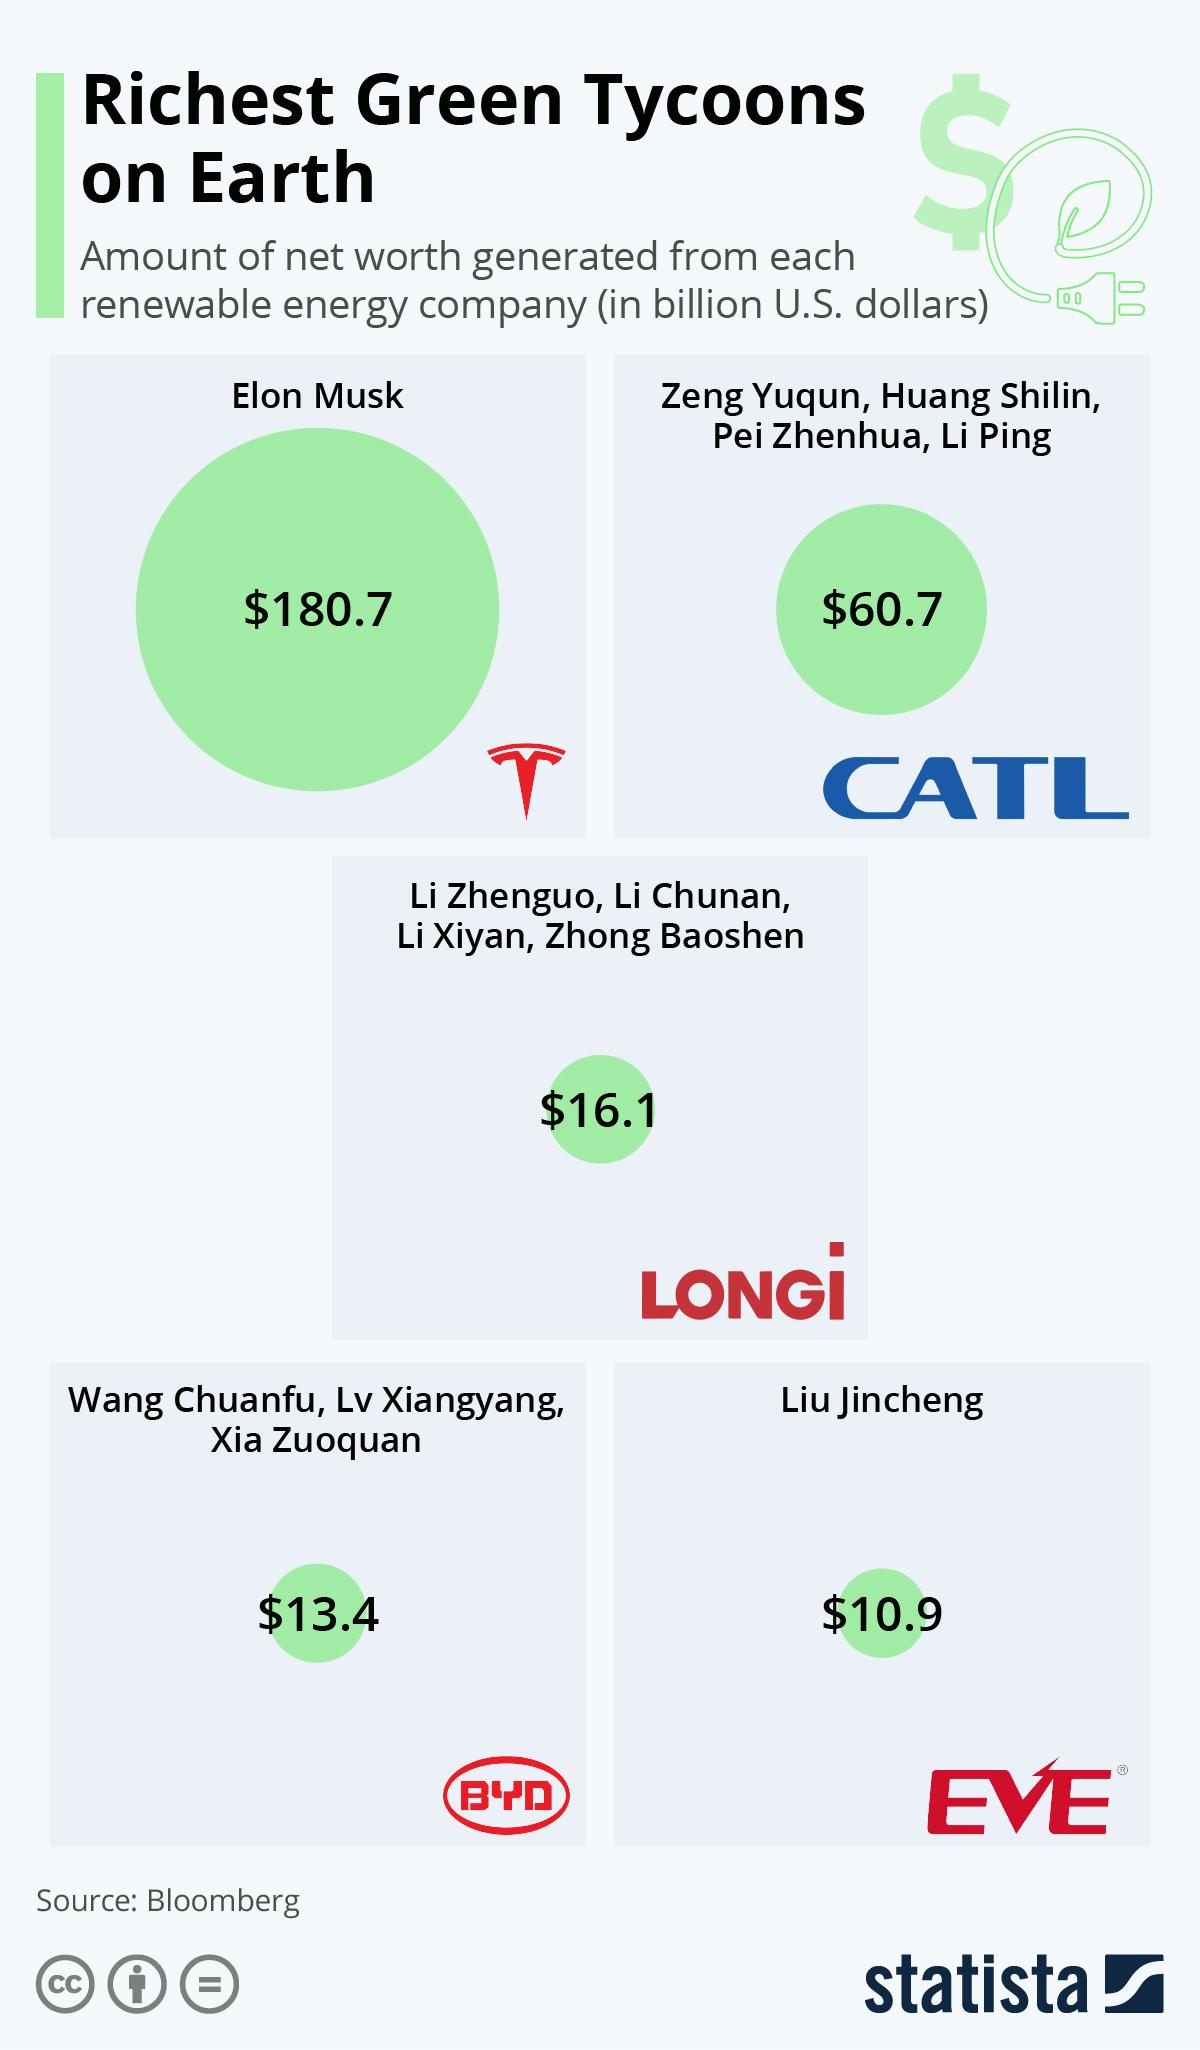 Top 5 wealthiest green tycoons